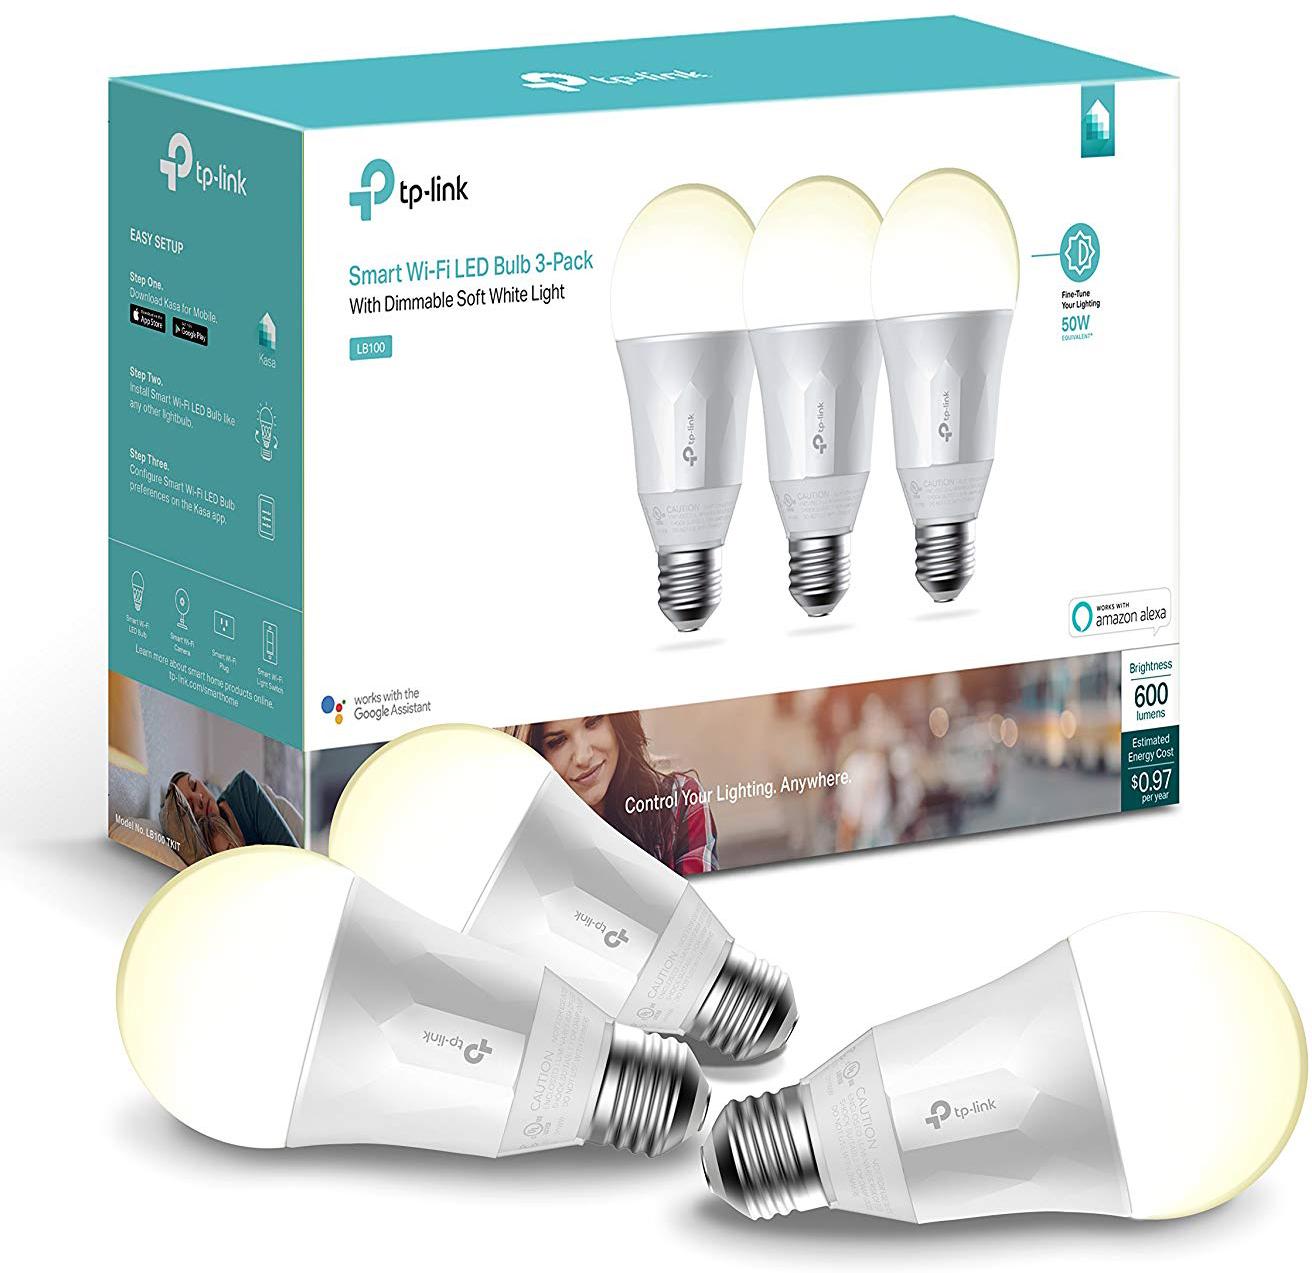 tp-link-smart-light-3-pack-01.jpg